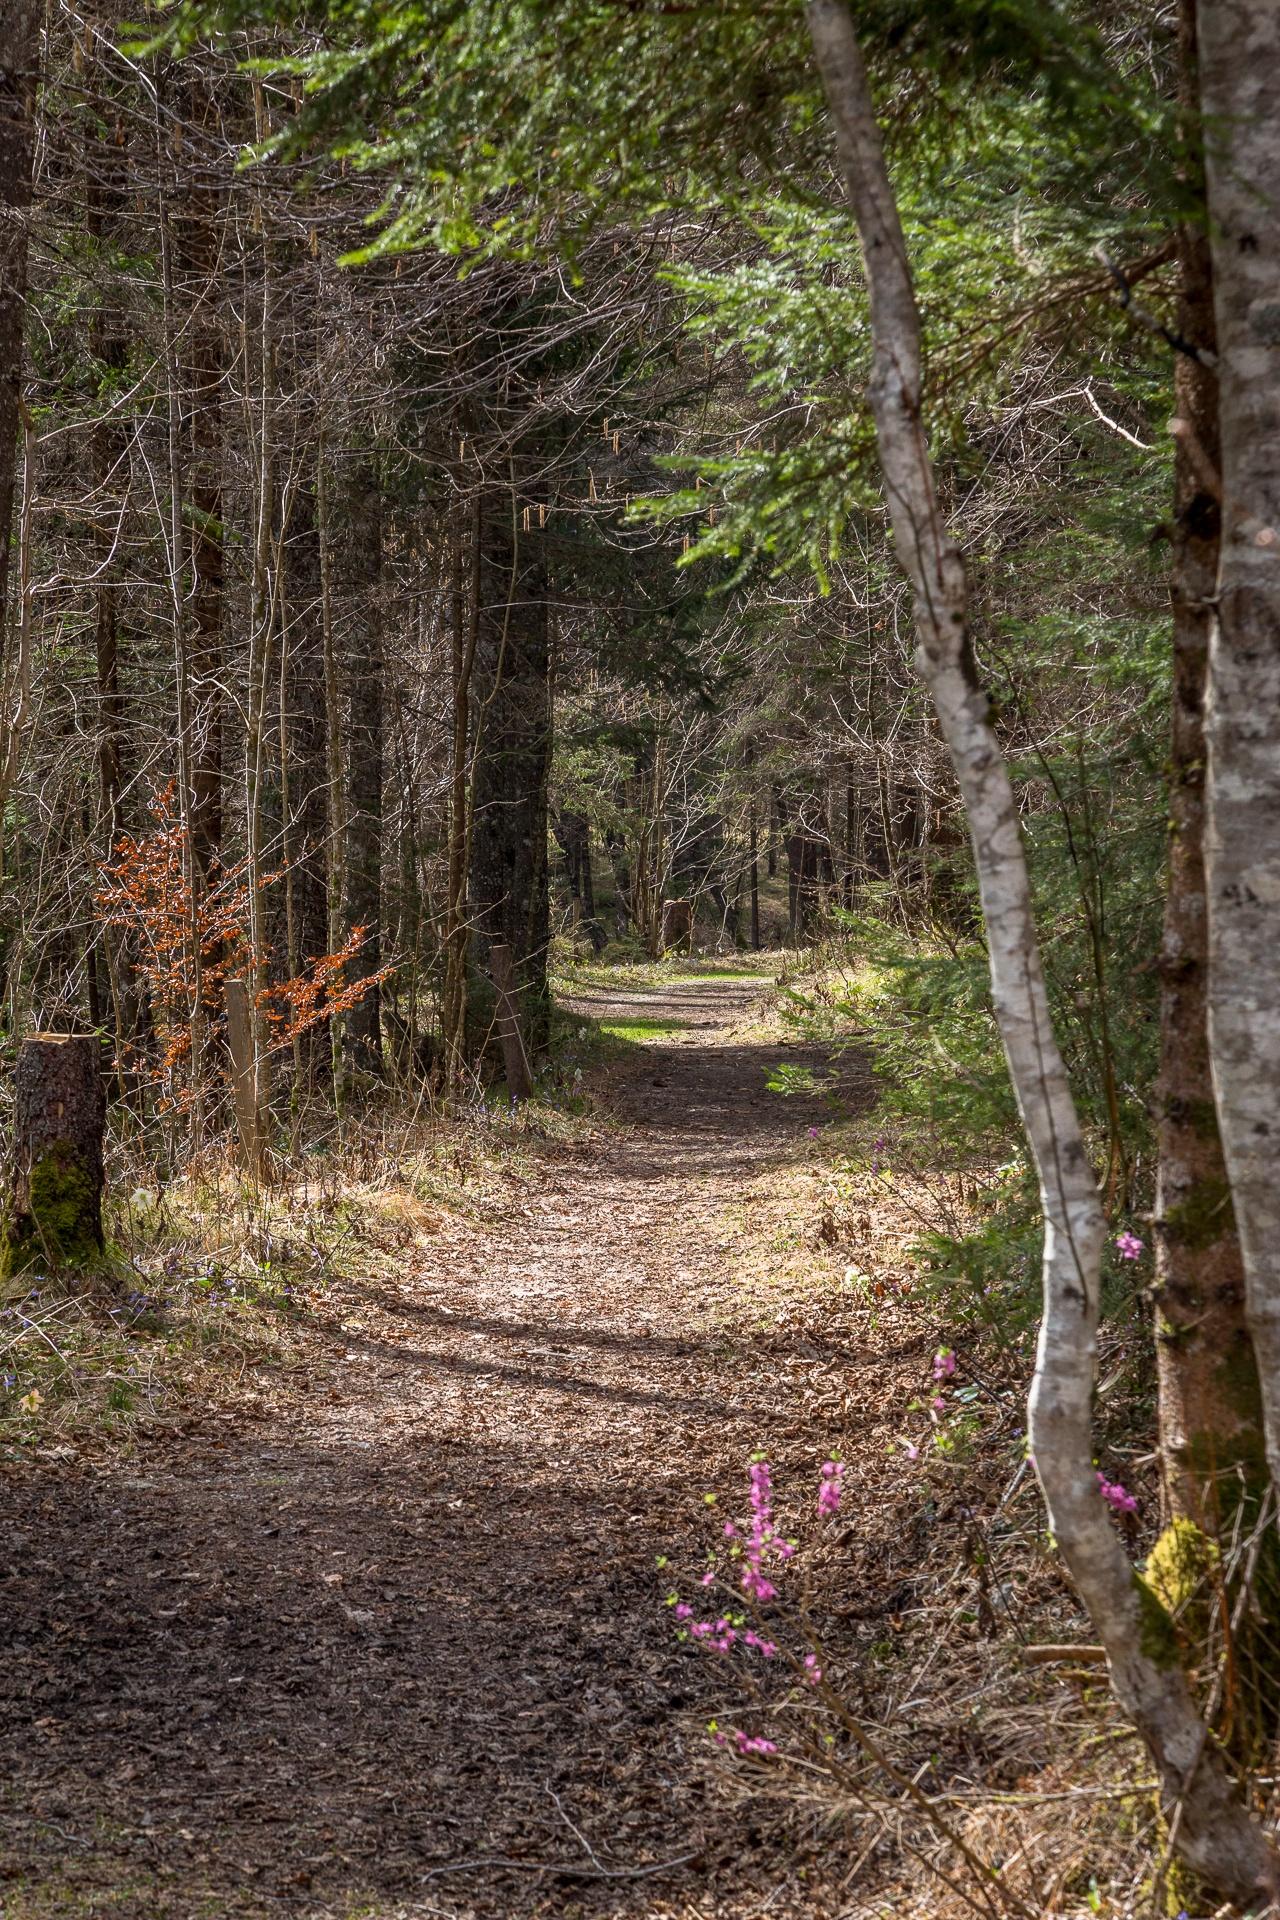 A track through a Slovenian forest